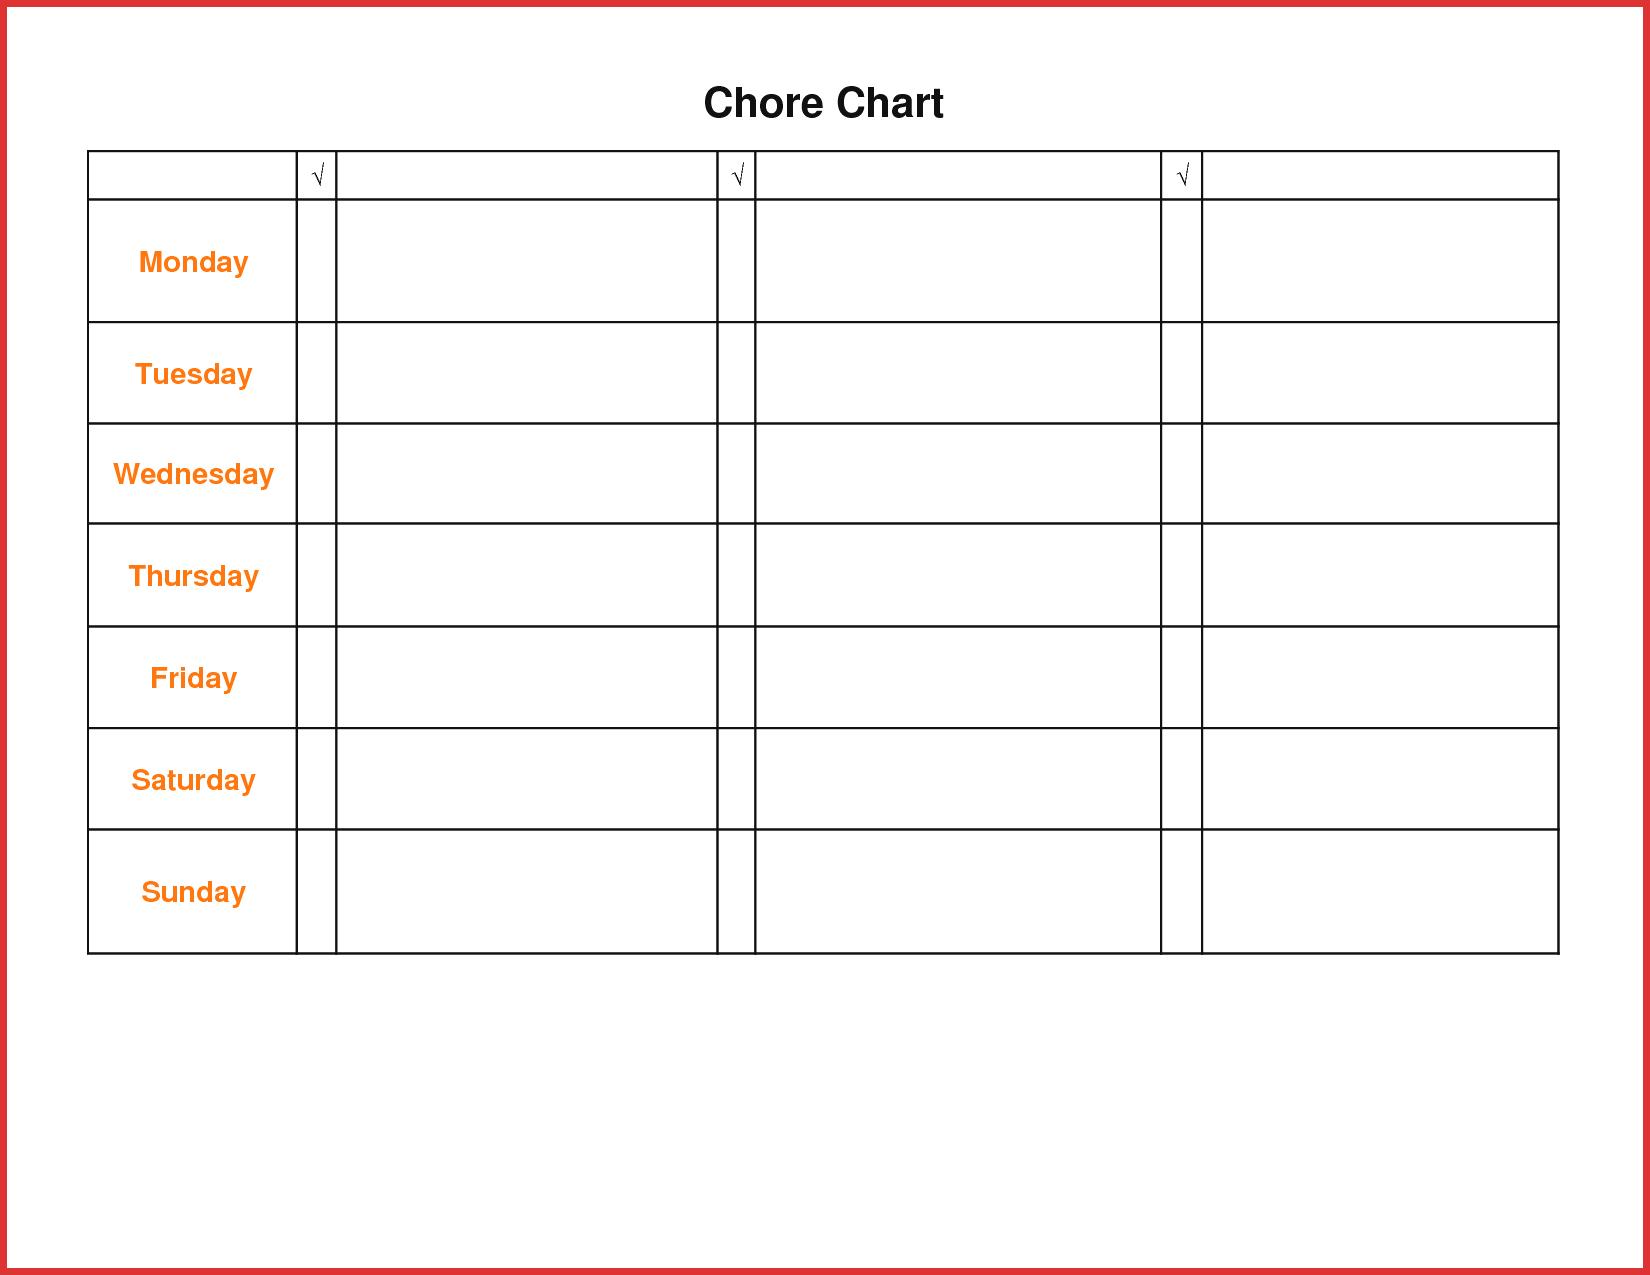 Printable Chore Chart For Teens